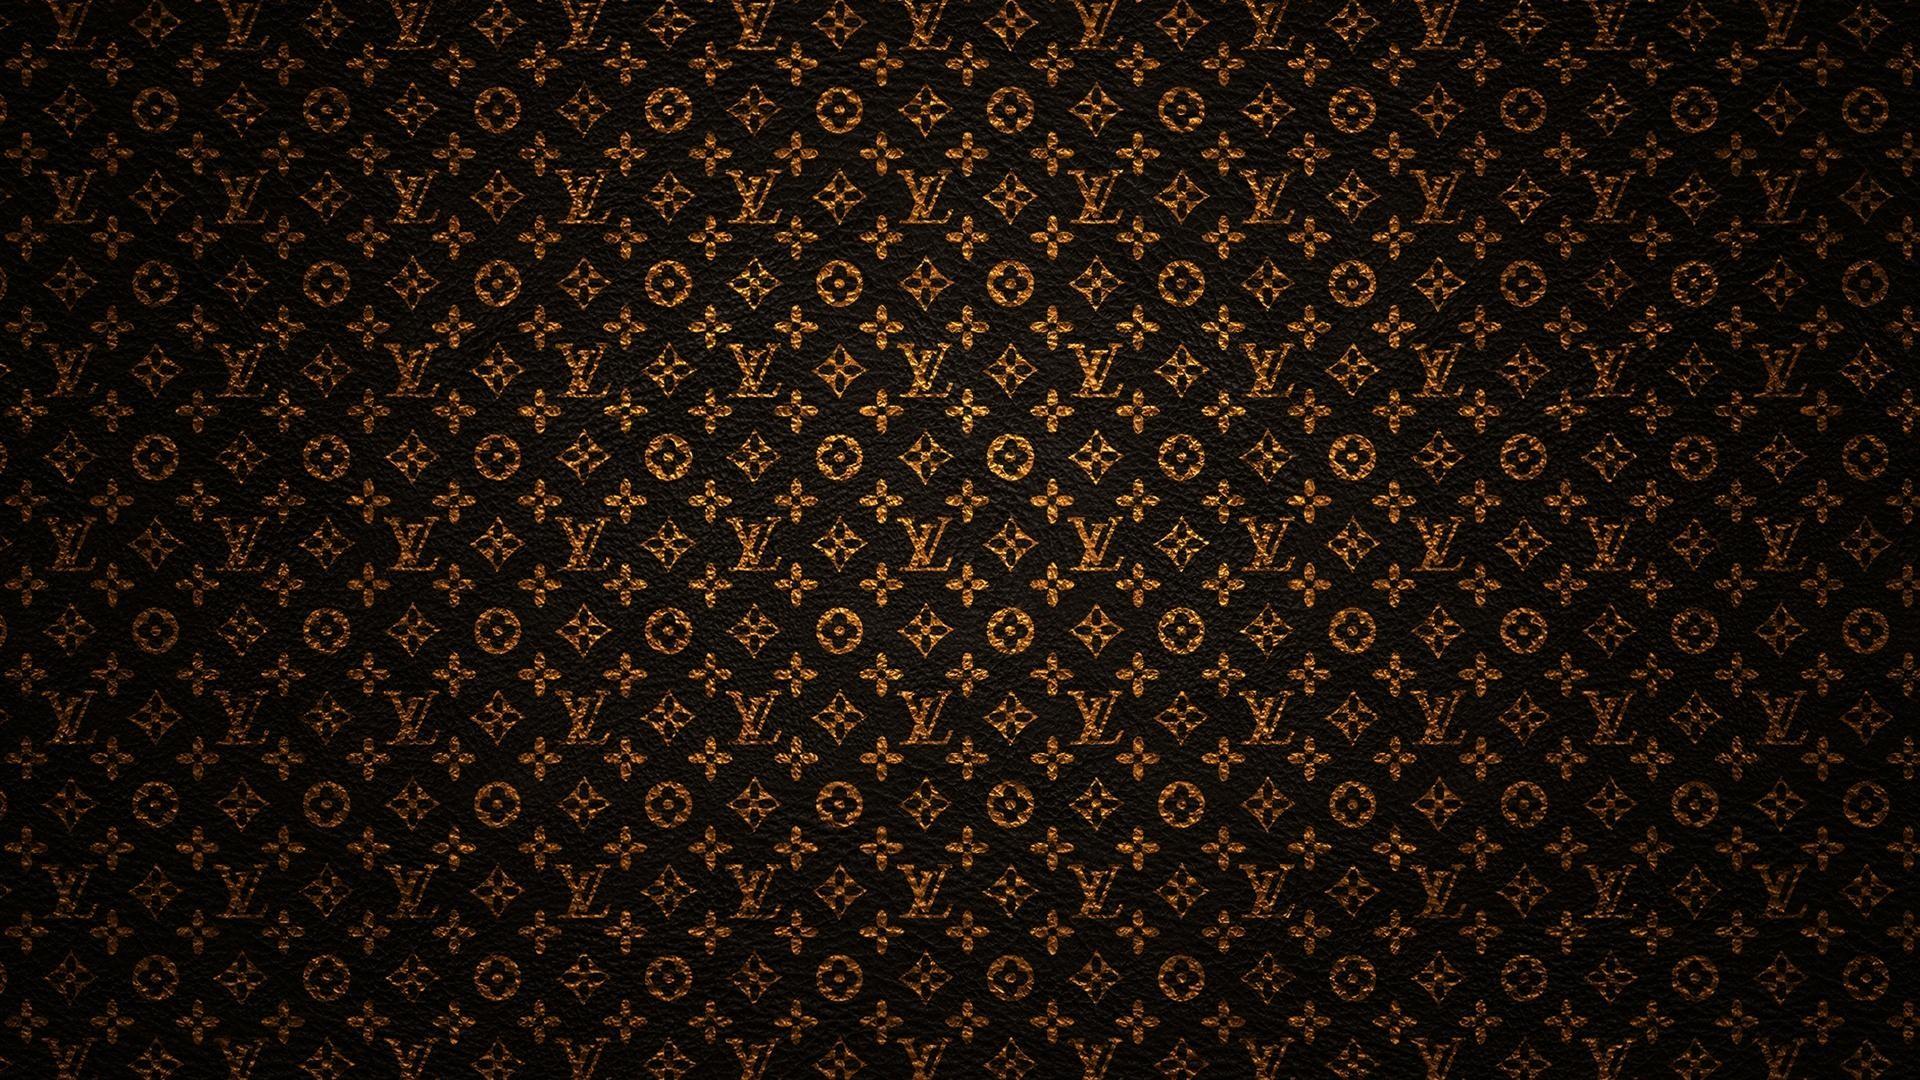 1920x1080 Desktop Wallpaper For Versace Carlton Leapman 2016 02 22